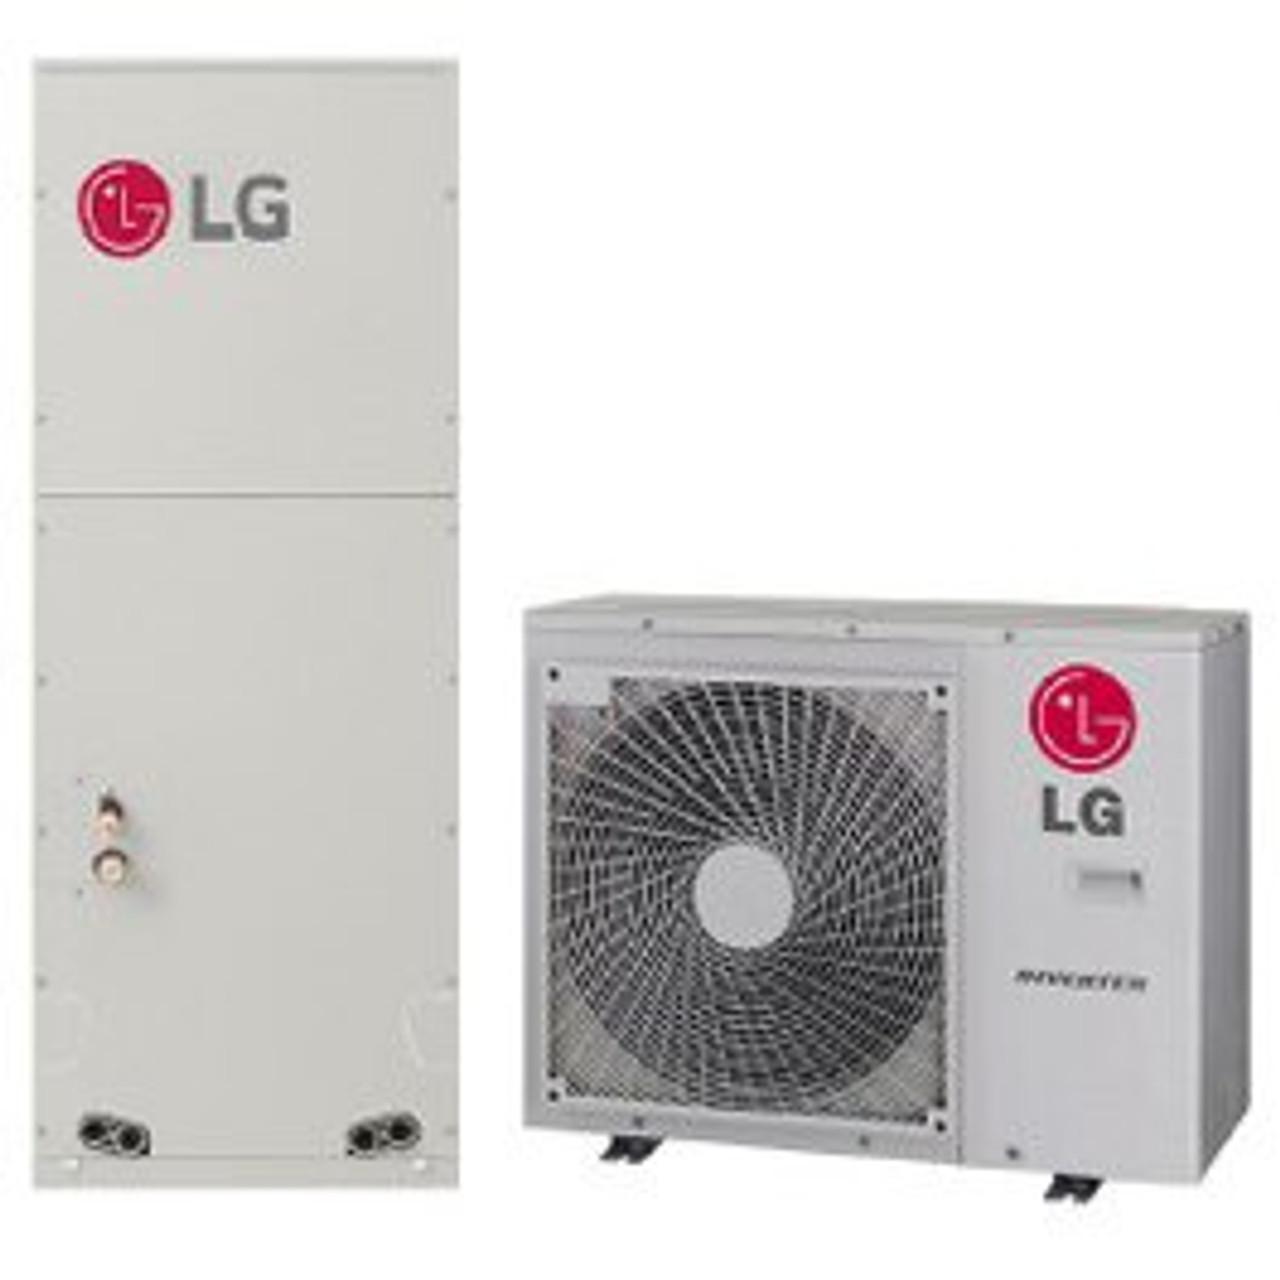 Lg Lv180hv4 18000 Btu Multi Position Air Handler Single